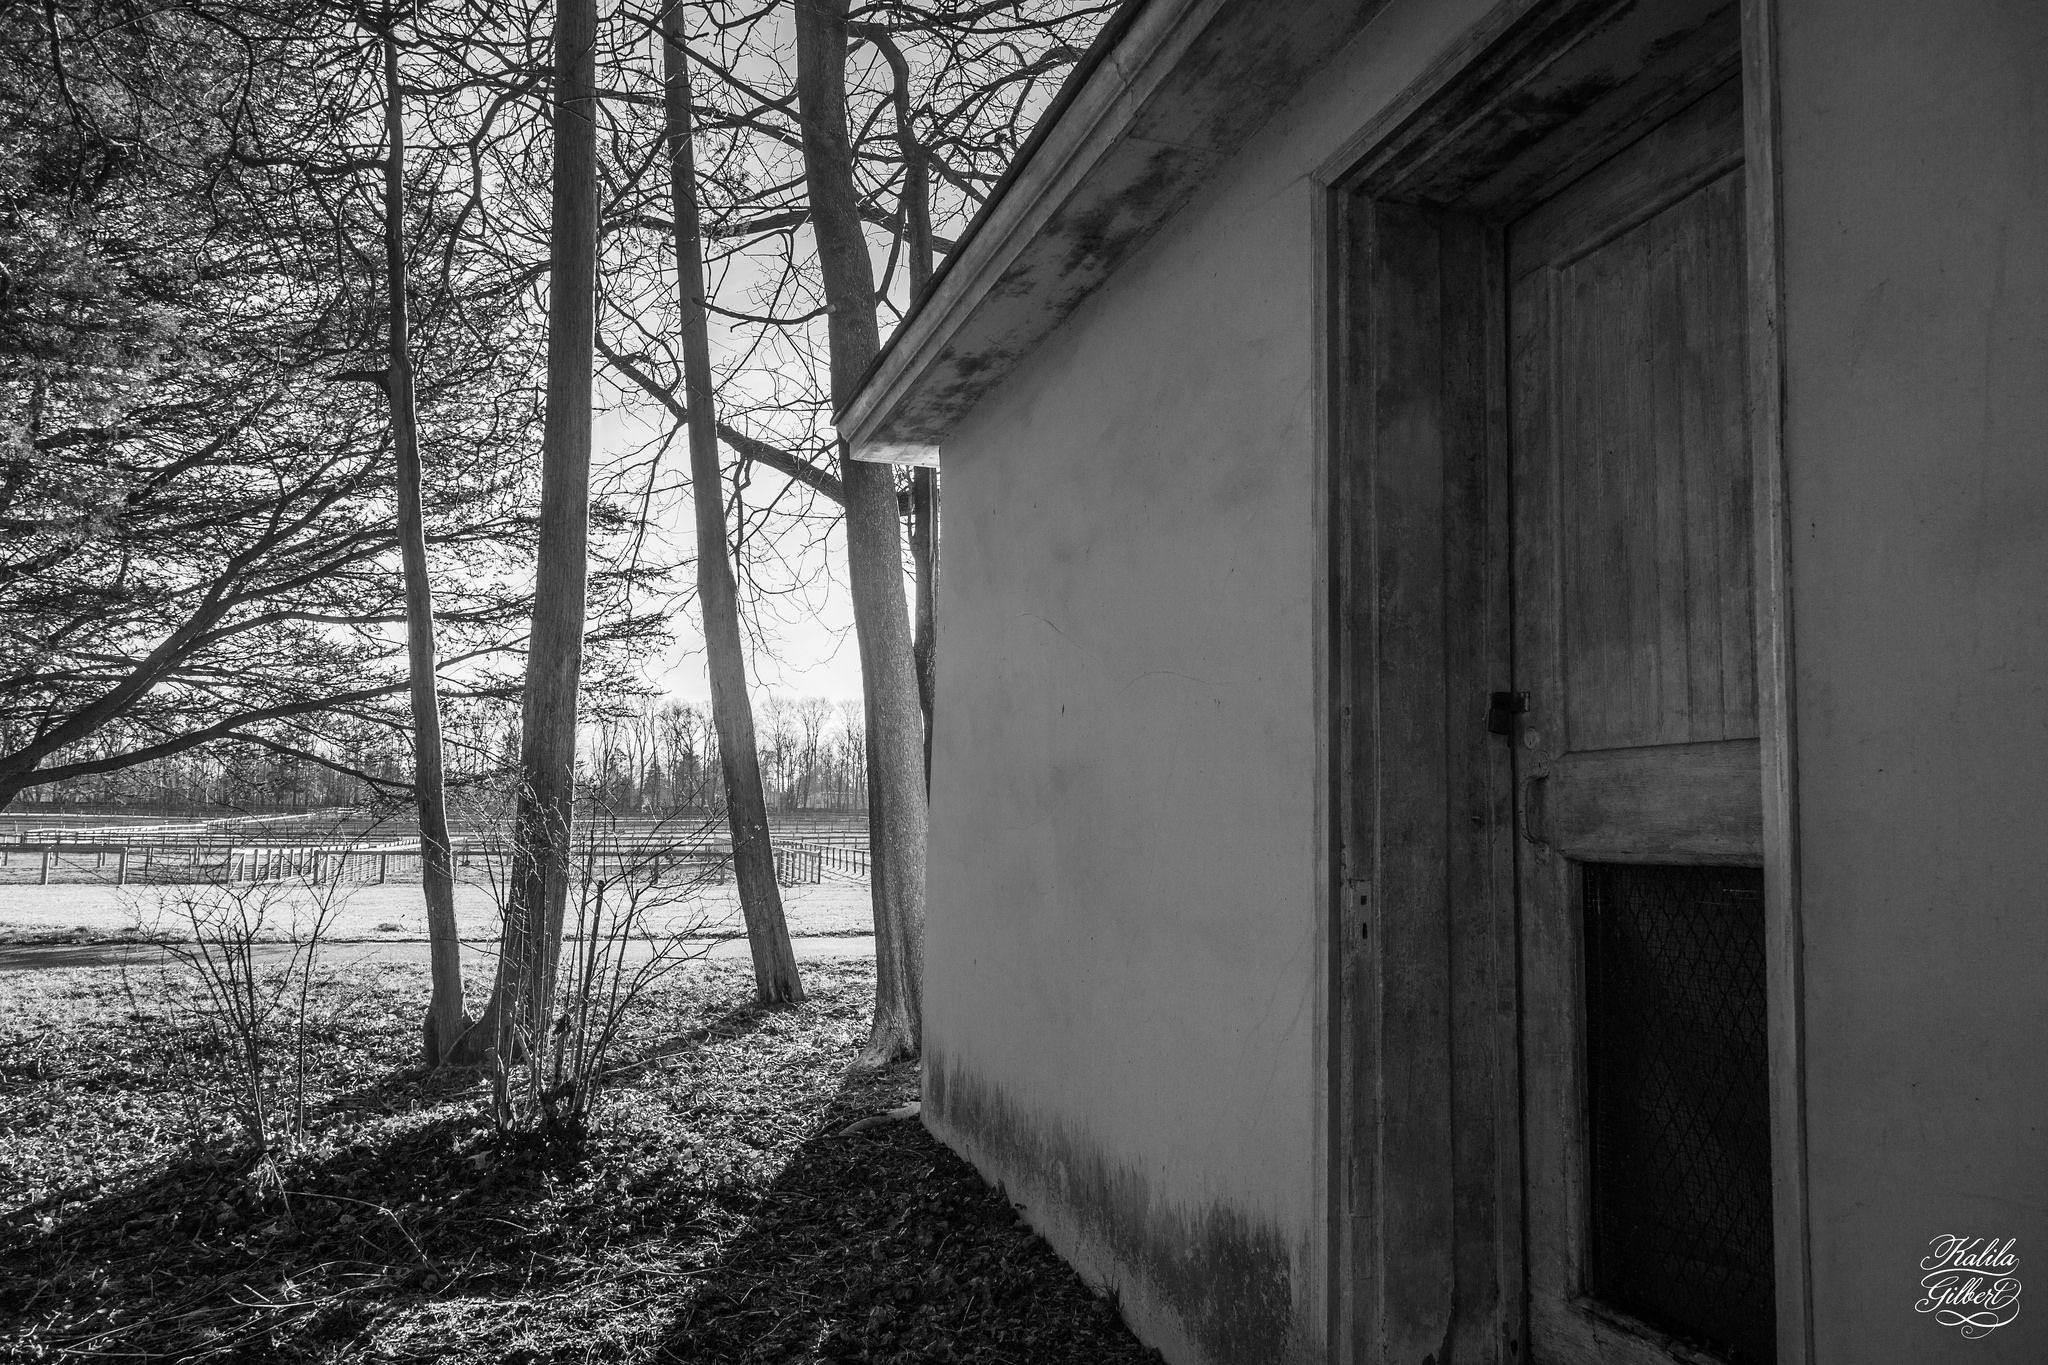 https://flic.kr/p/DSnJjY   Bellevue State Park in black and white